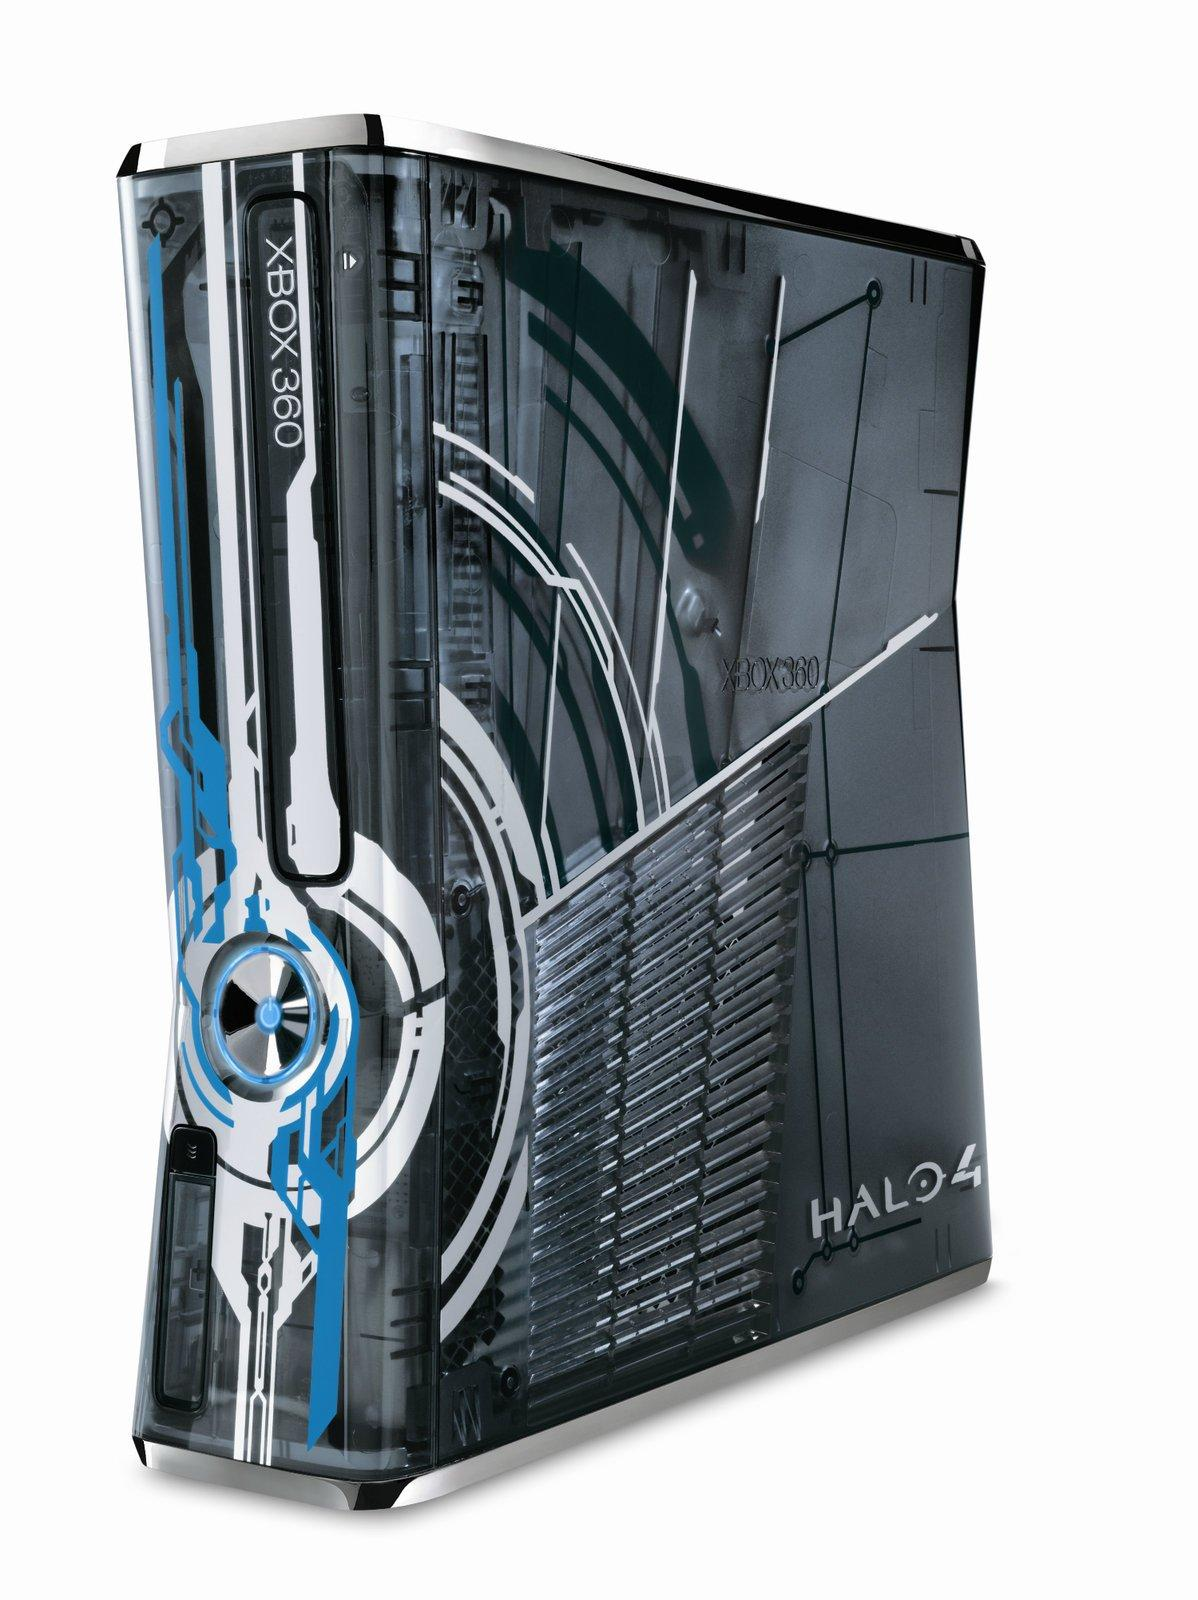 Xbox 360 S 320gb System Halo 4 Gamestop Premium